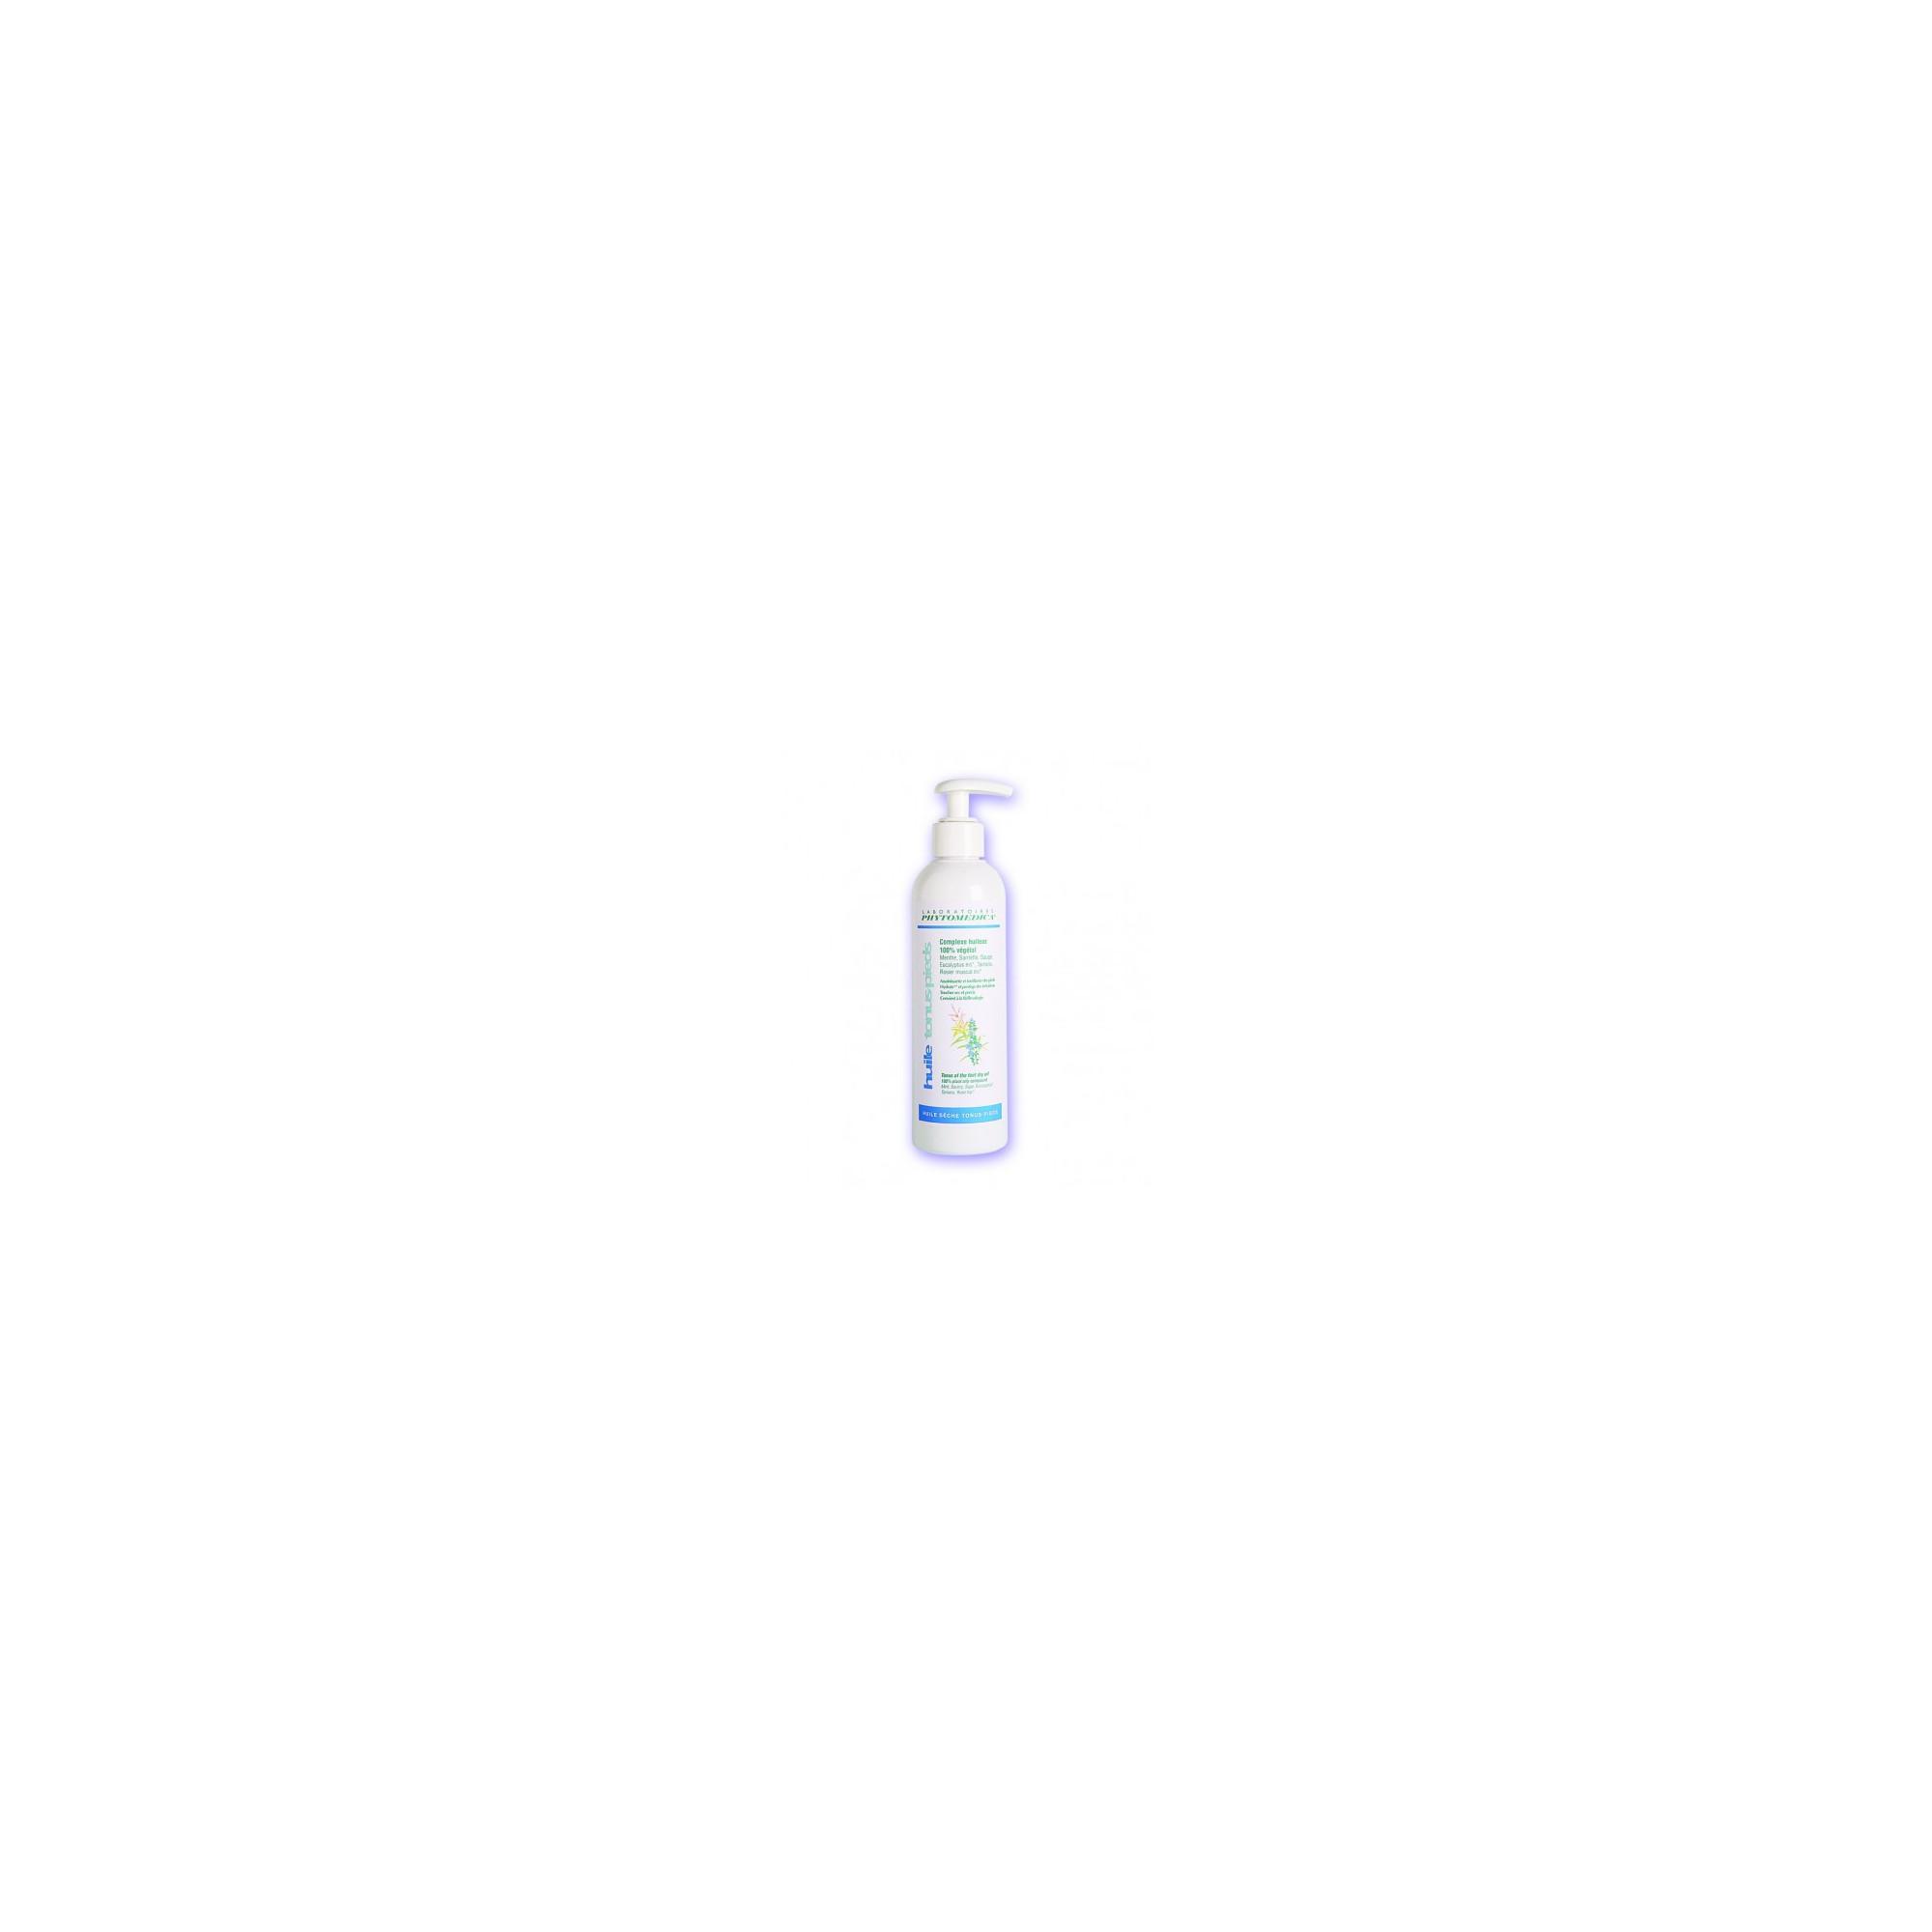 Phytomedica - Huile sèche Tonus-pieds - 250ml